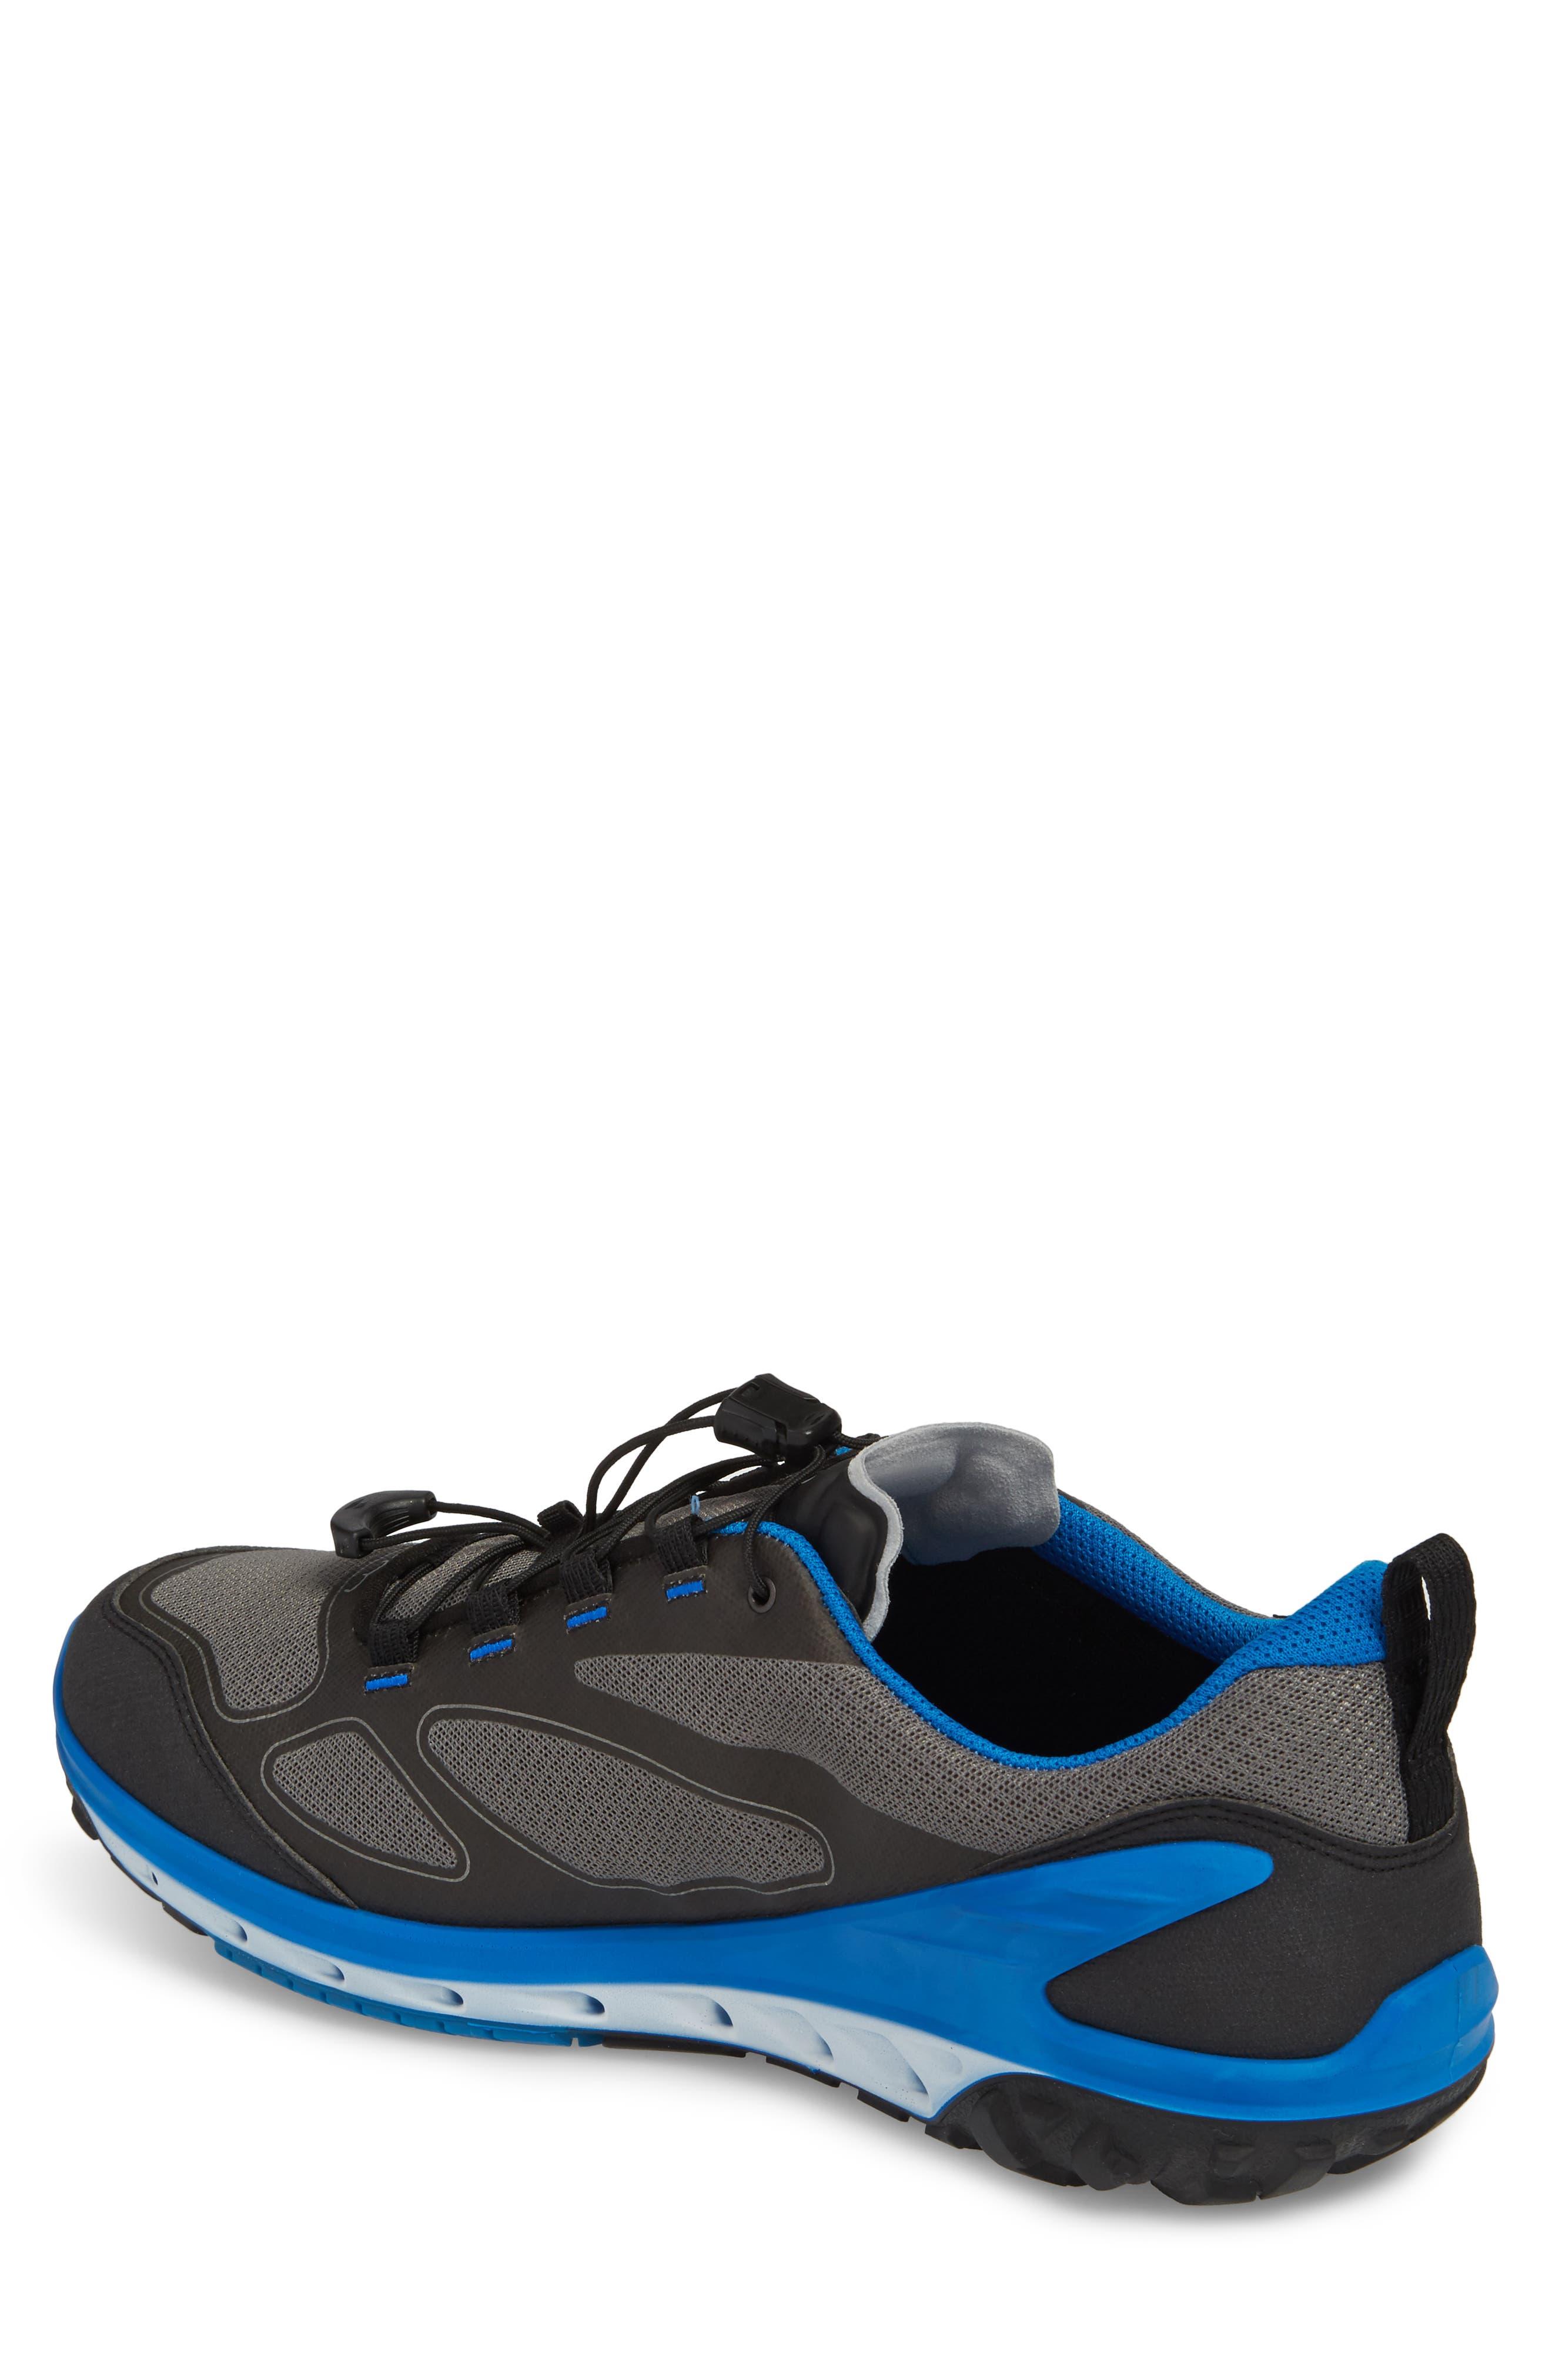 BIOM Venture GTX Sneaker,                             Alternate thumbnail 2, color,                             Black/ Titanium Leather